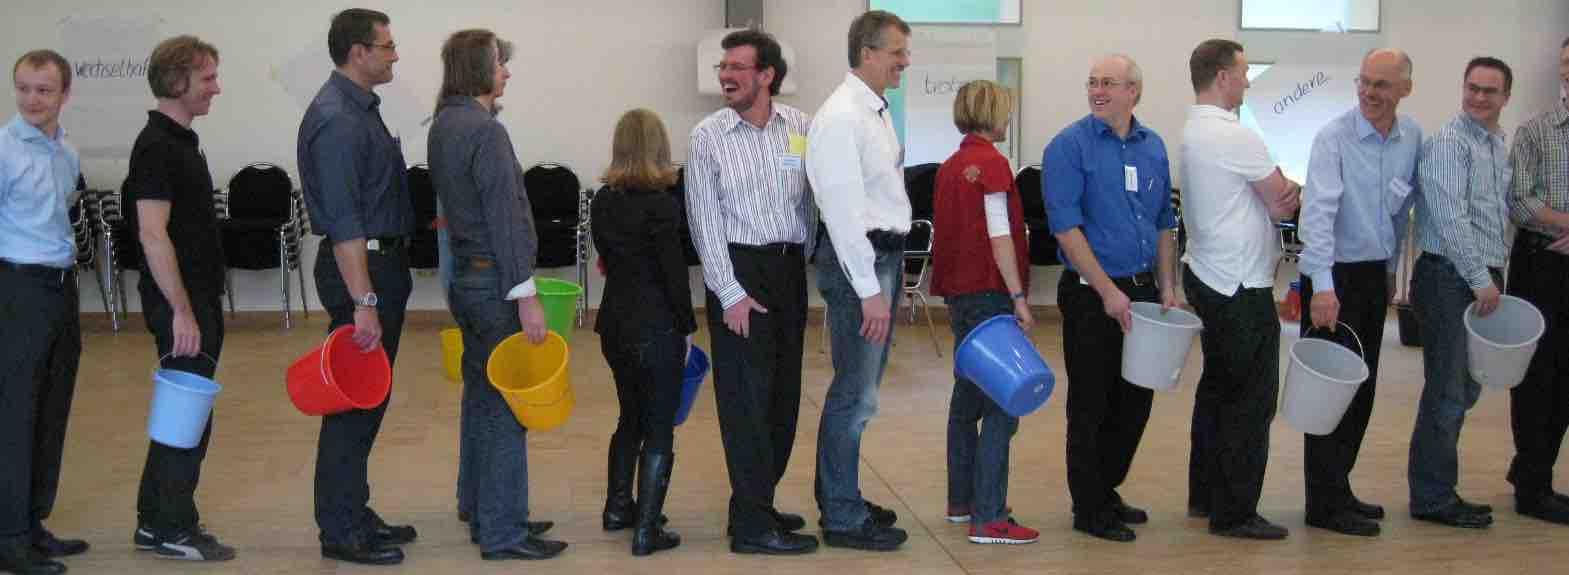 2017/ 03 Theater im Grundschulalter – Fortbildung